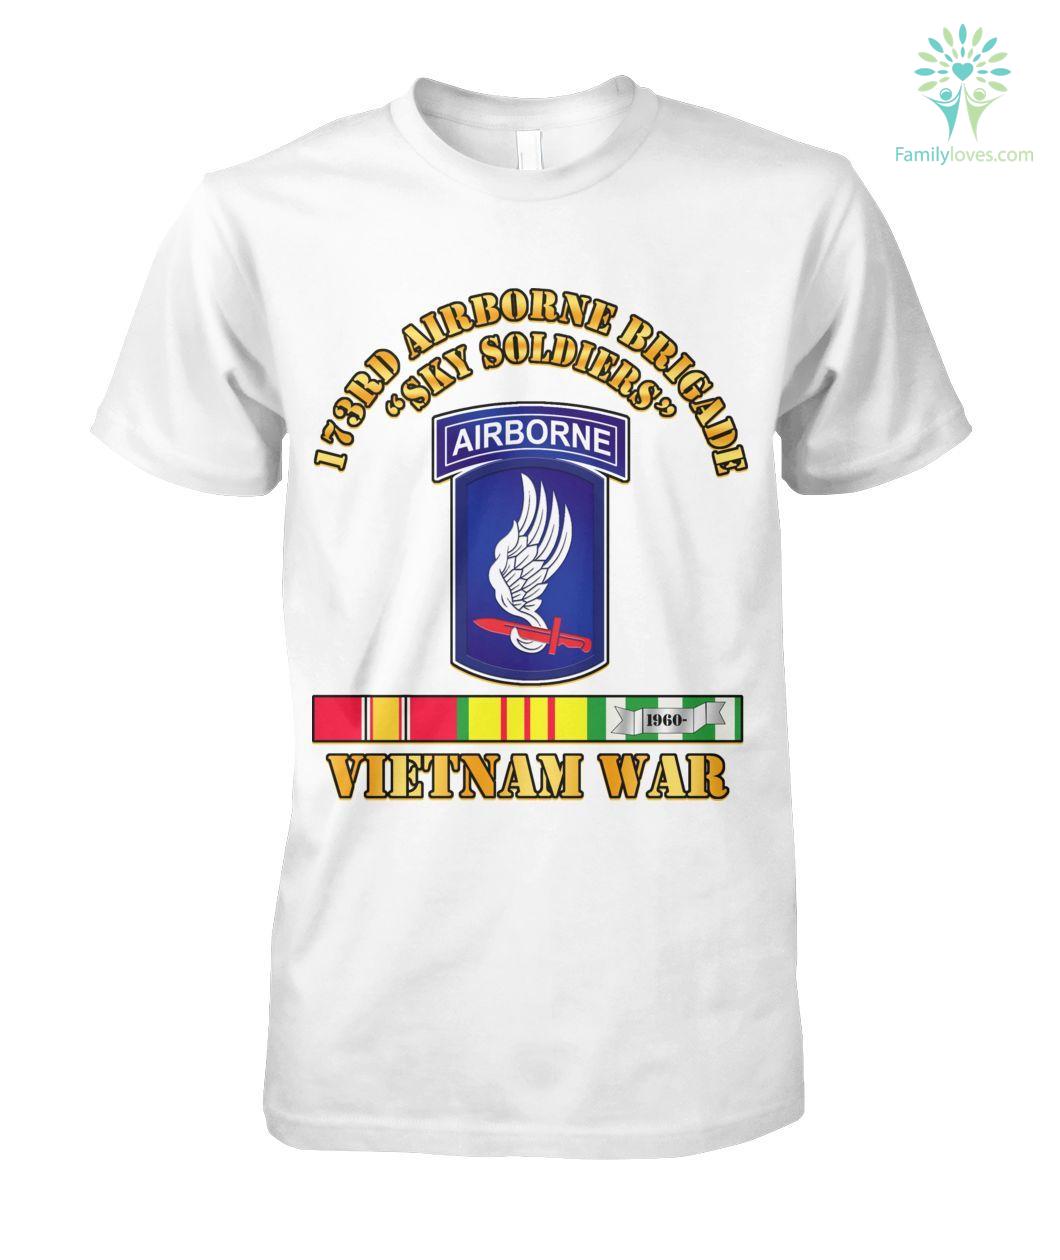 173rd-airborne-brigade_e63cc99c-efa5-e817-29b6-54aff8777ea5 173rd Airborne Brigade sky soldiers vietnam war hoodie, sweatshirt, t-shirt  %tag